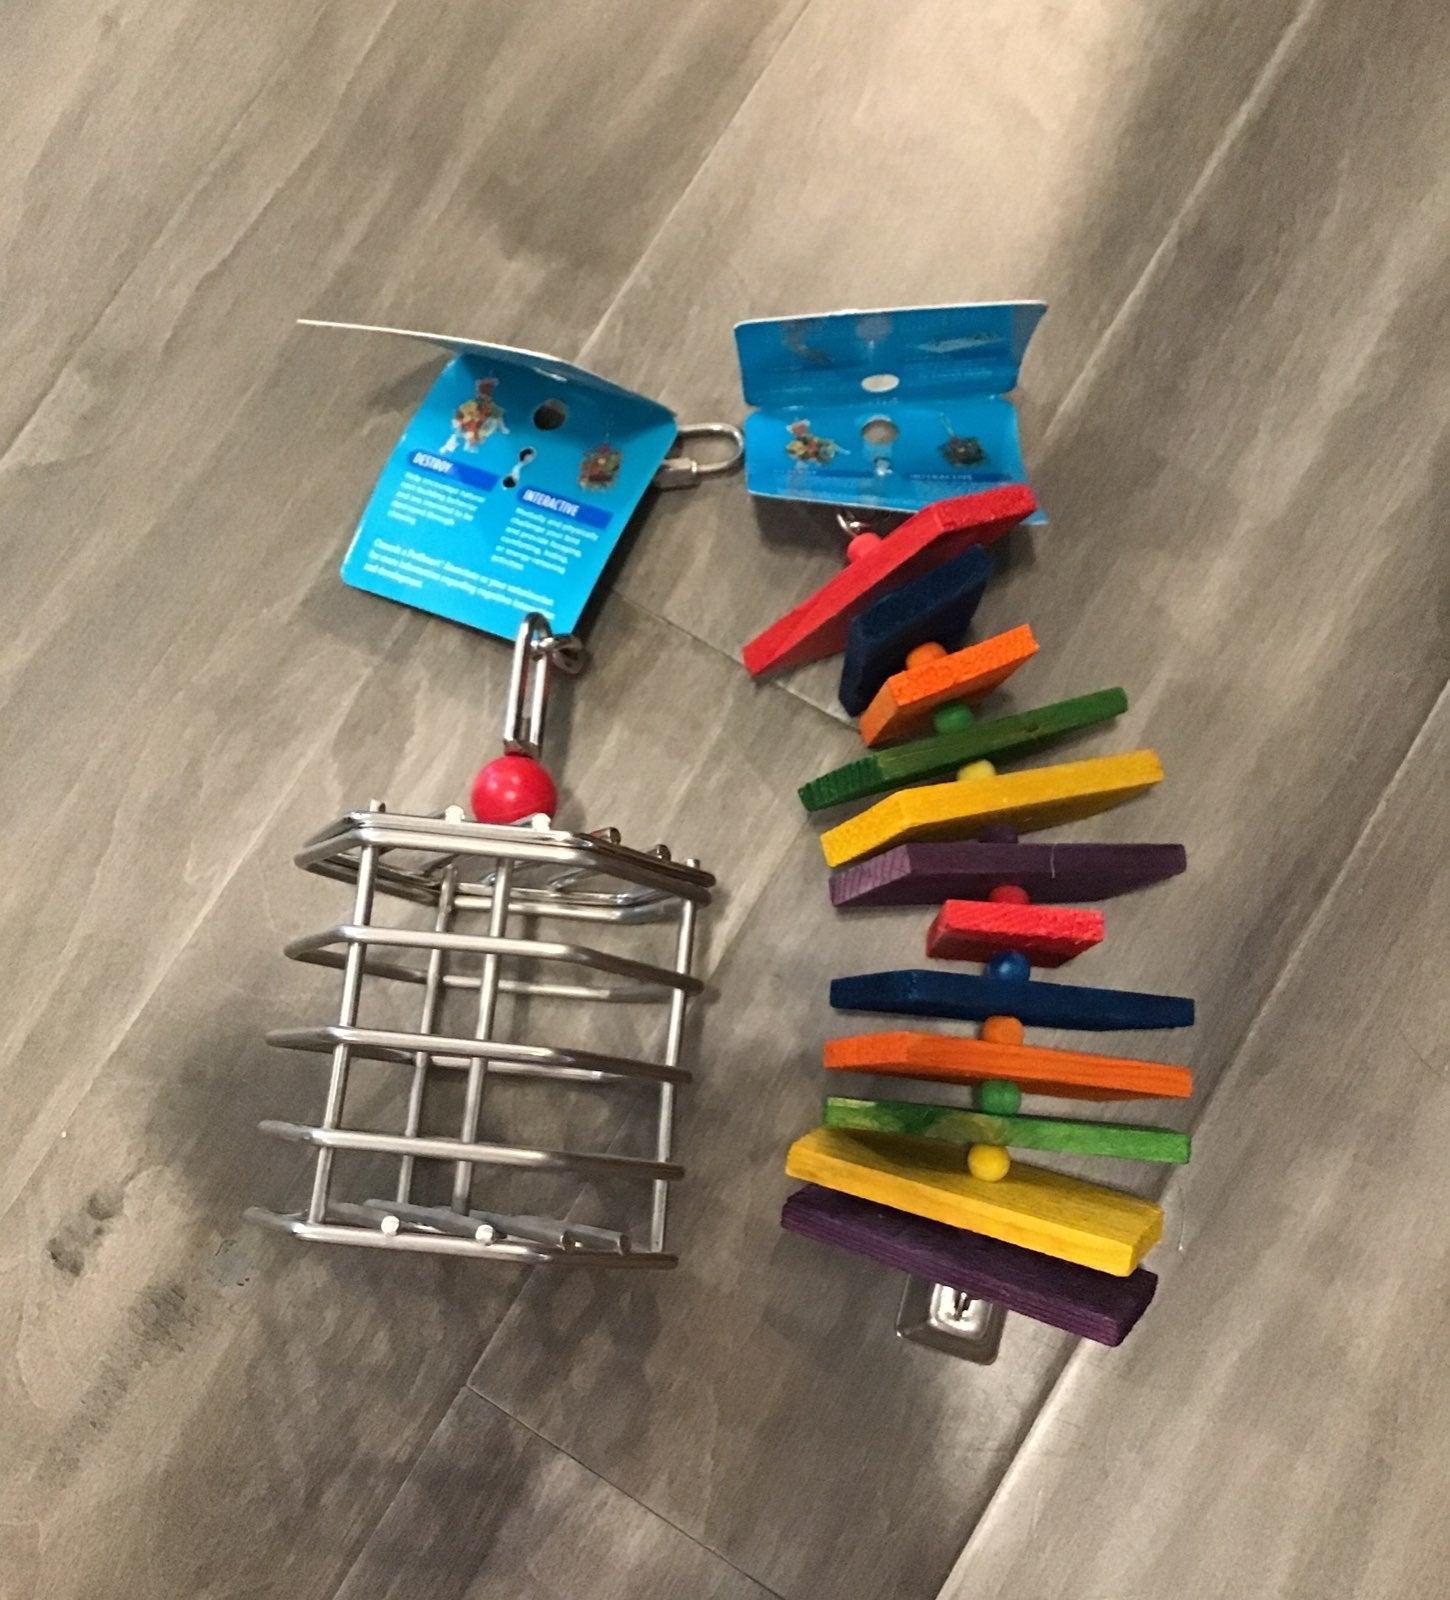 Nwt bird toys for medium to large birds